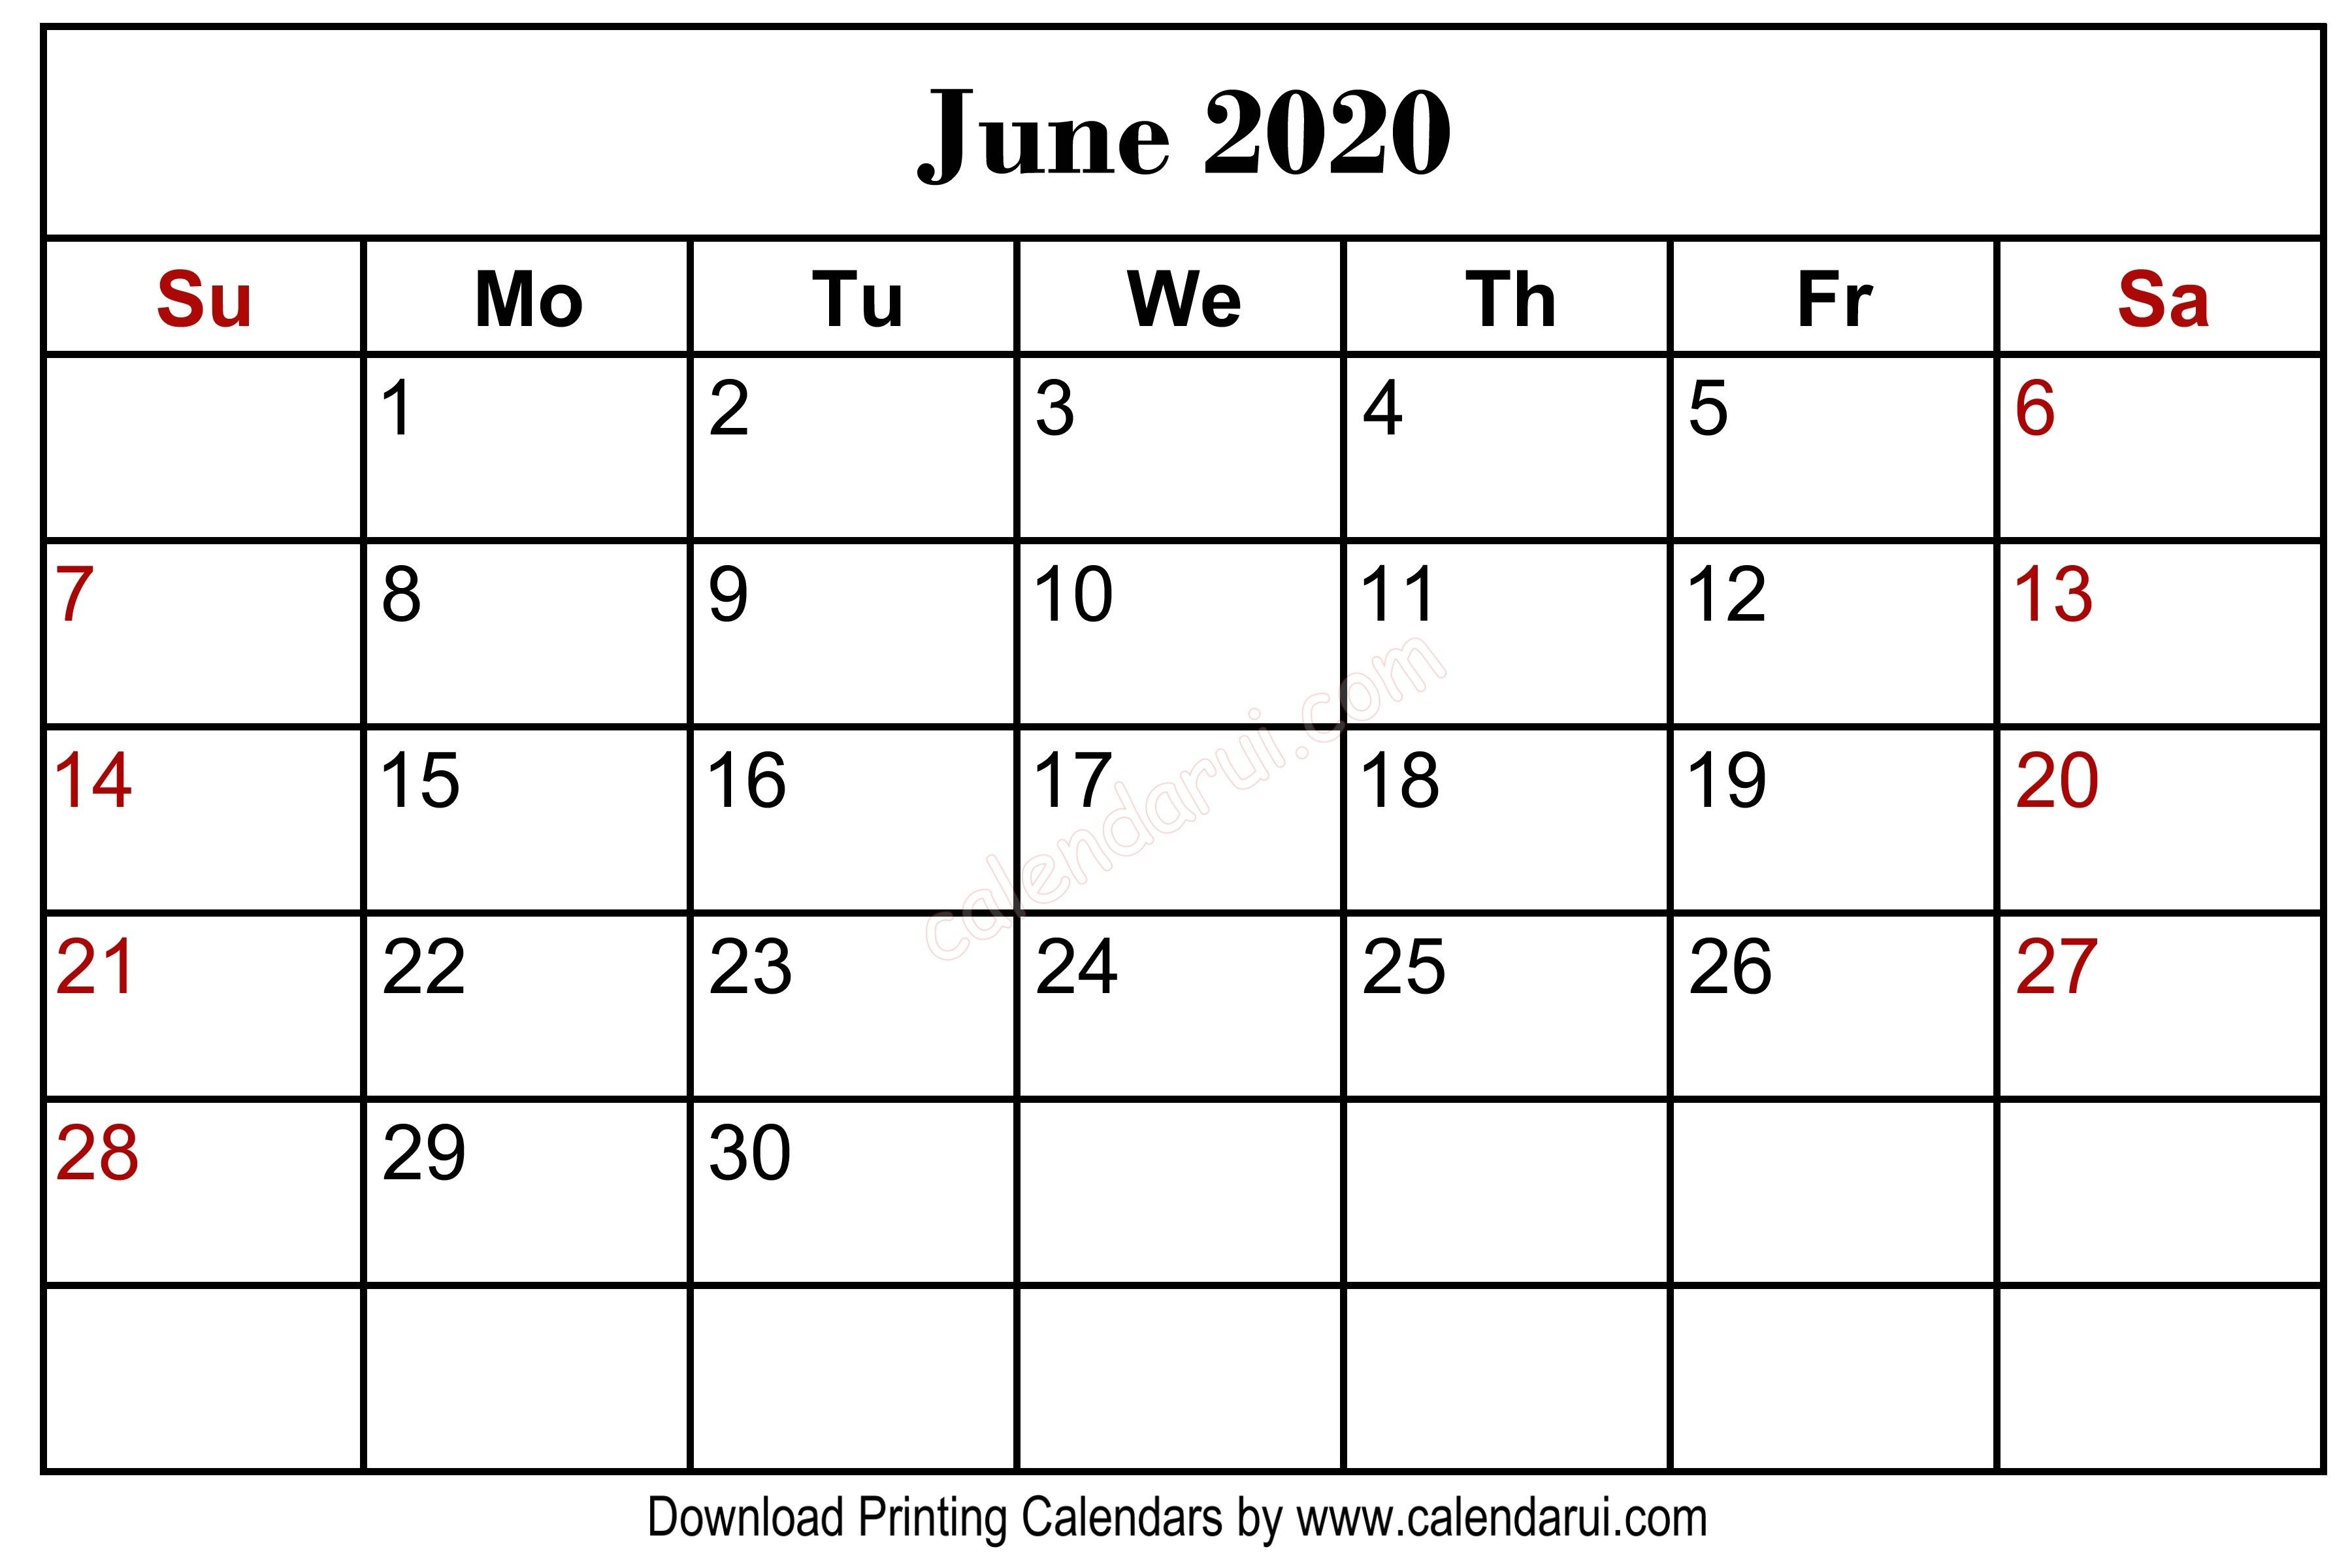 Homepage / 2020 Calendar / June 2020 Blank Calendar-January 2020 Hindu Calendar